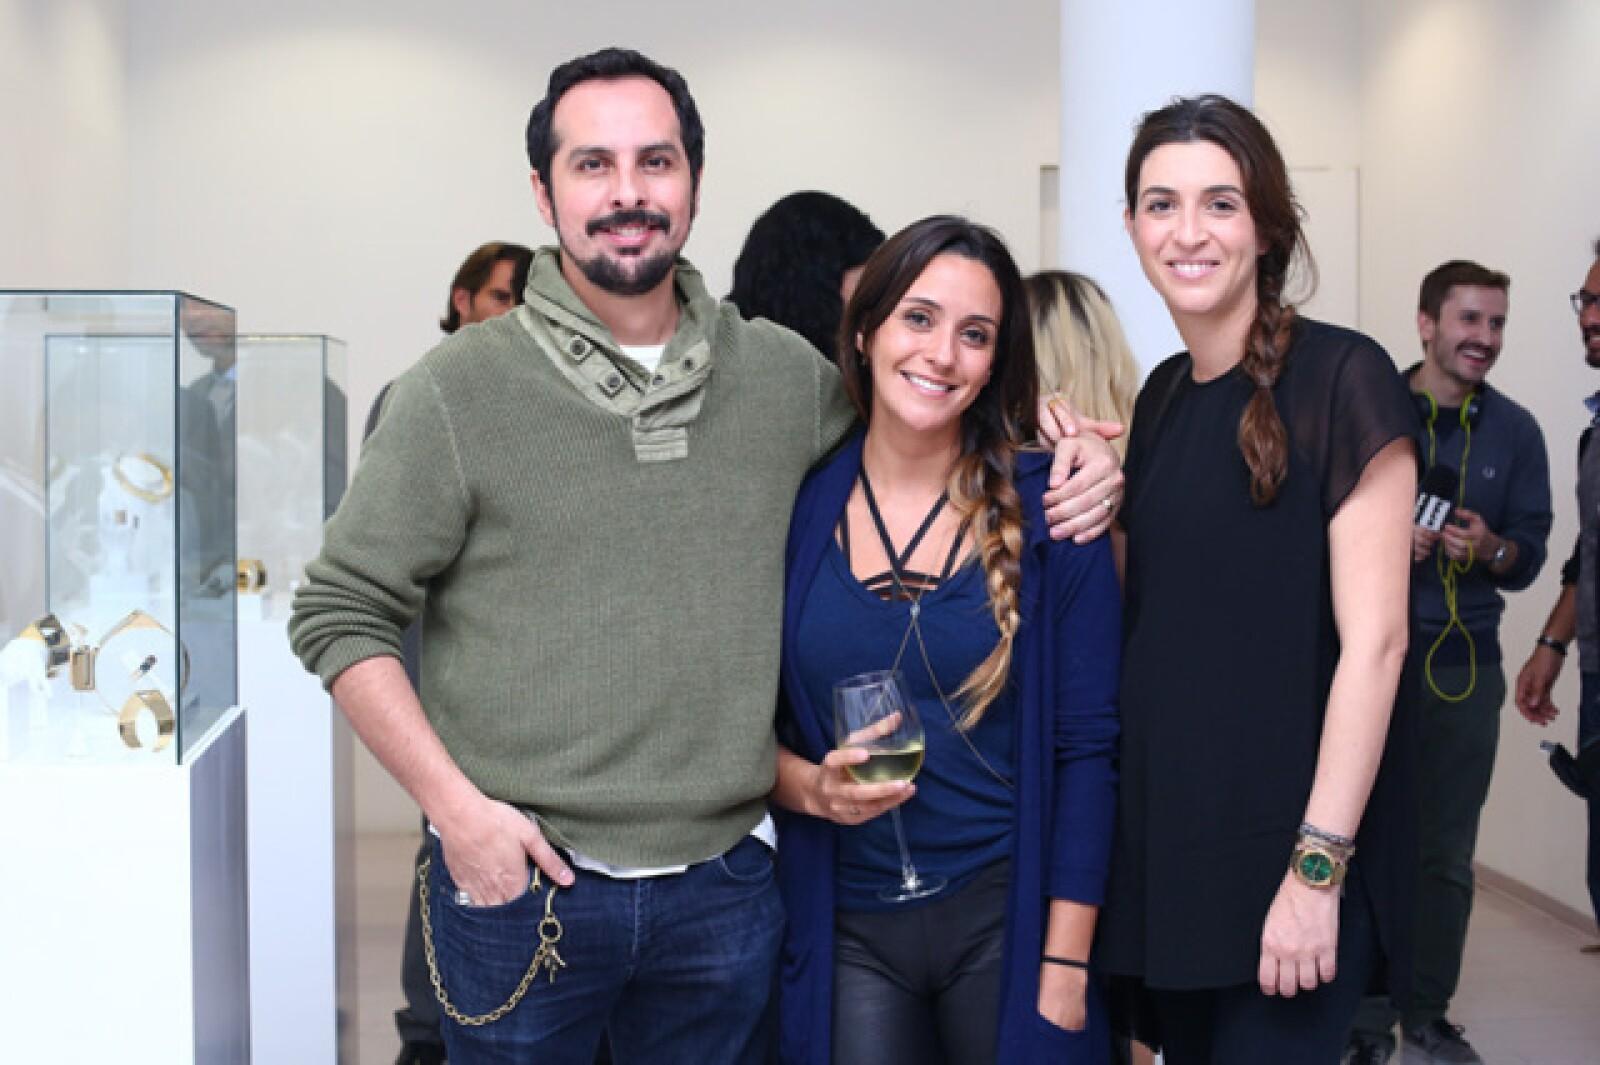 Santiago Rionda, Marcelo Lugo y Sandra Weil